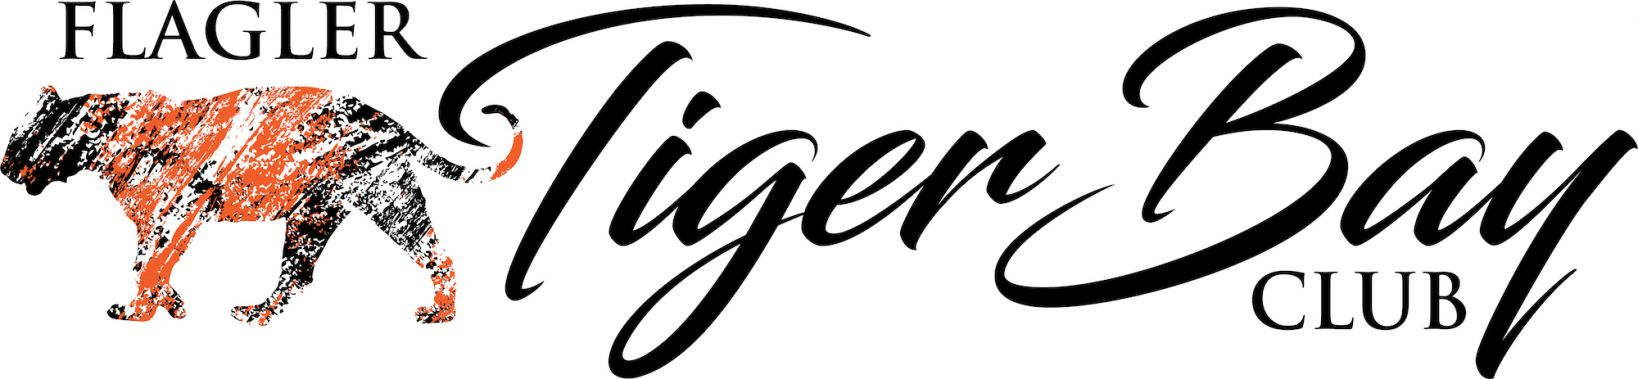 Flagler Tiger Bay Club will host a Feb. 21 school safety panel.